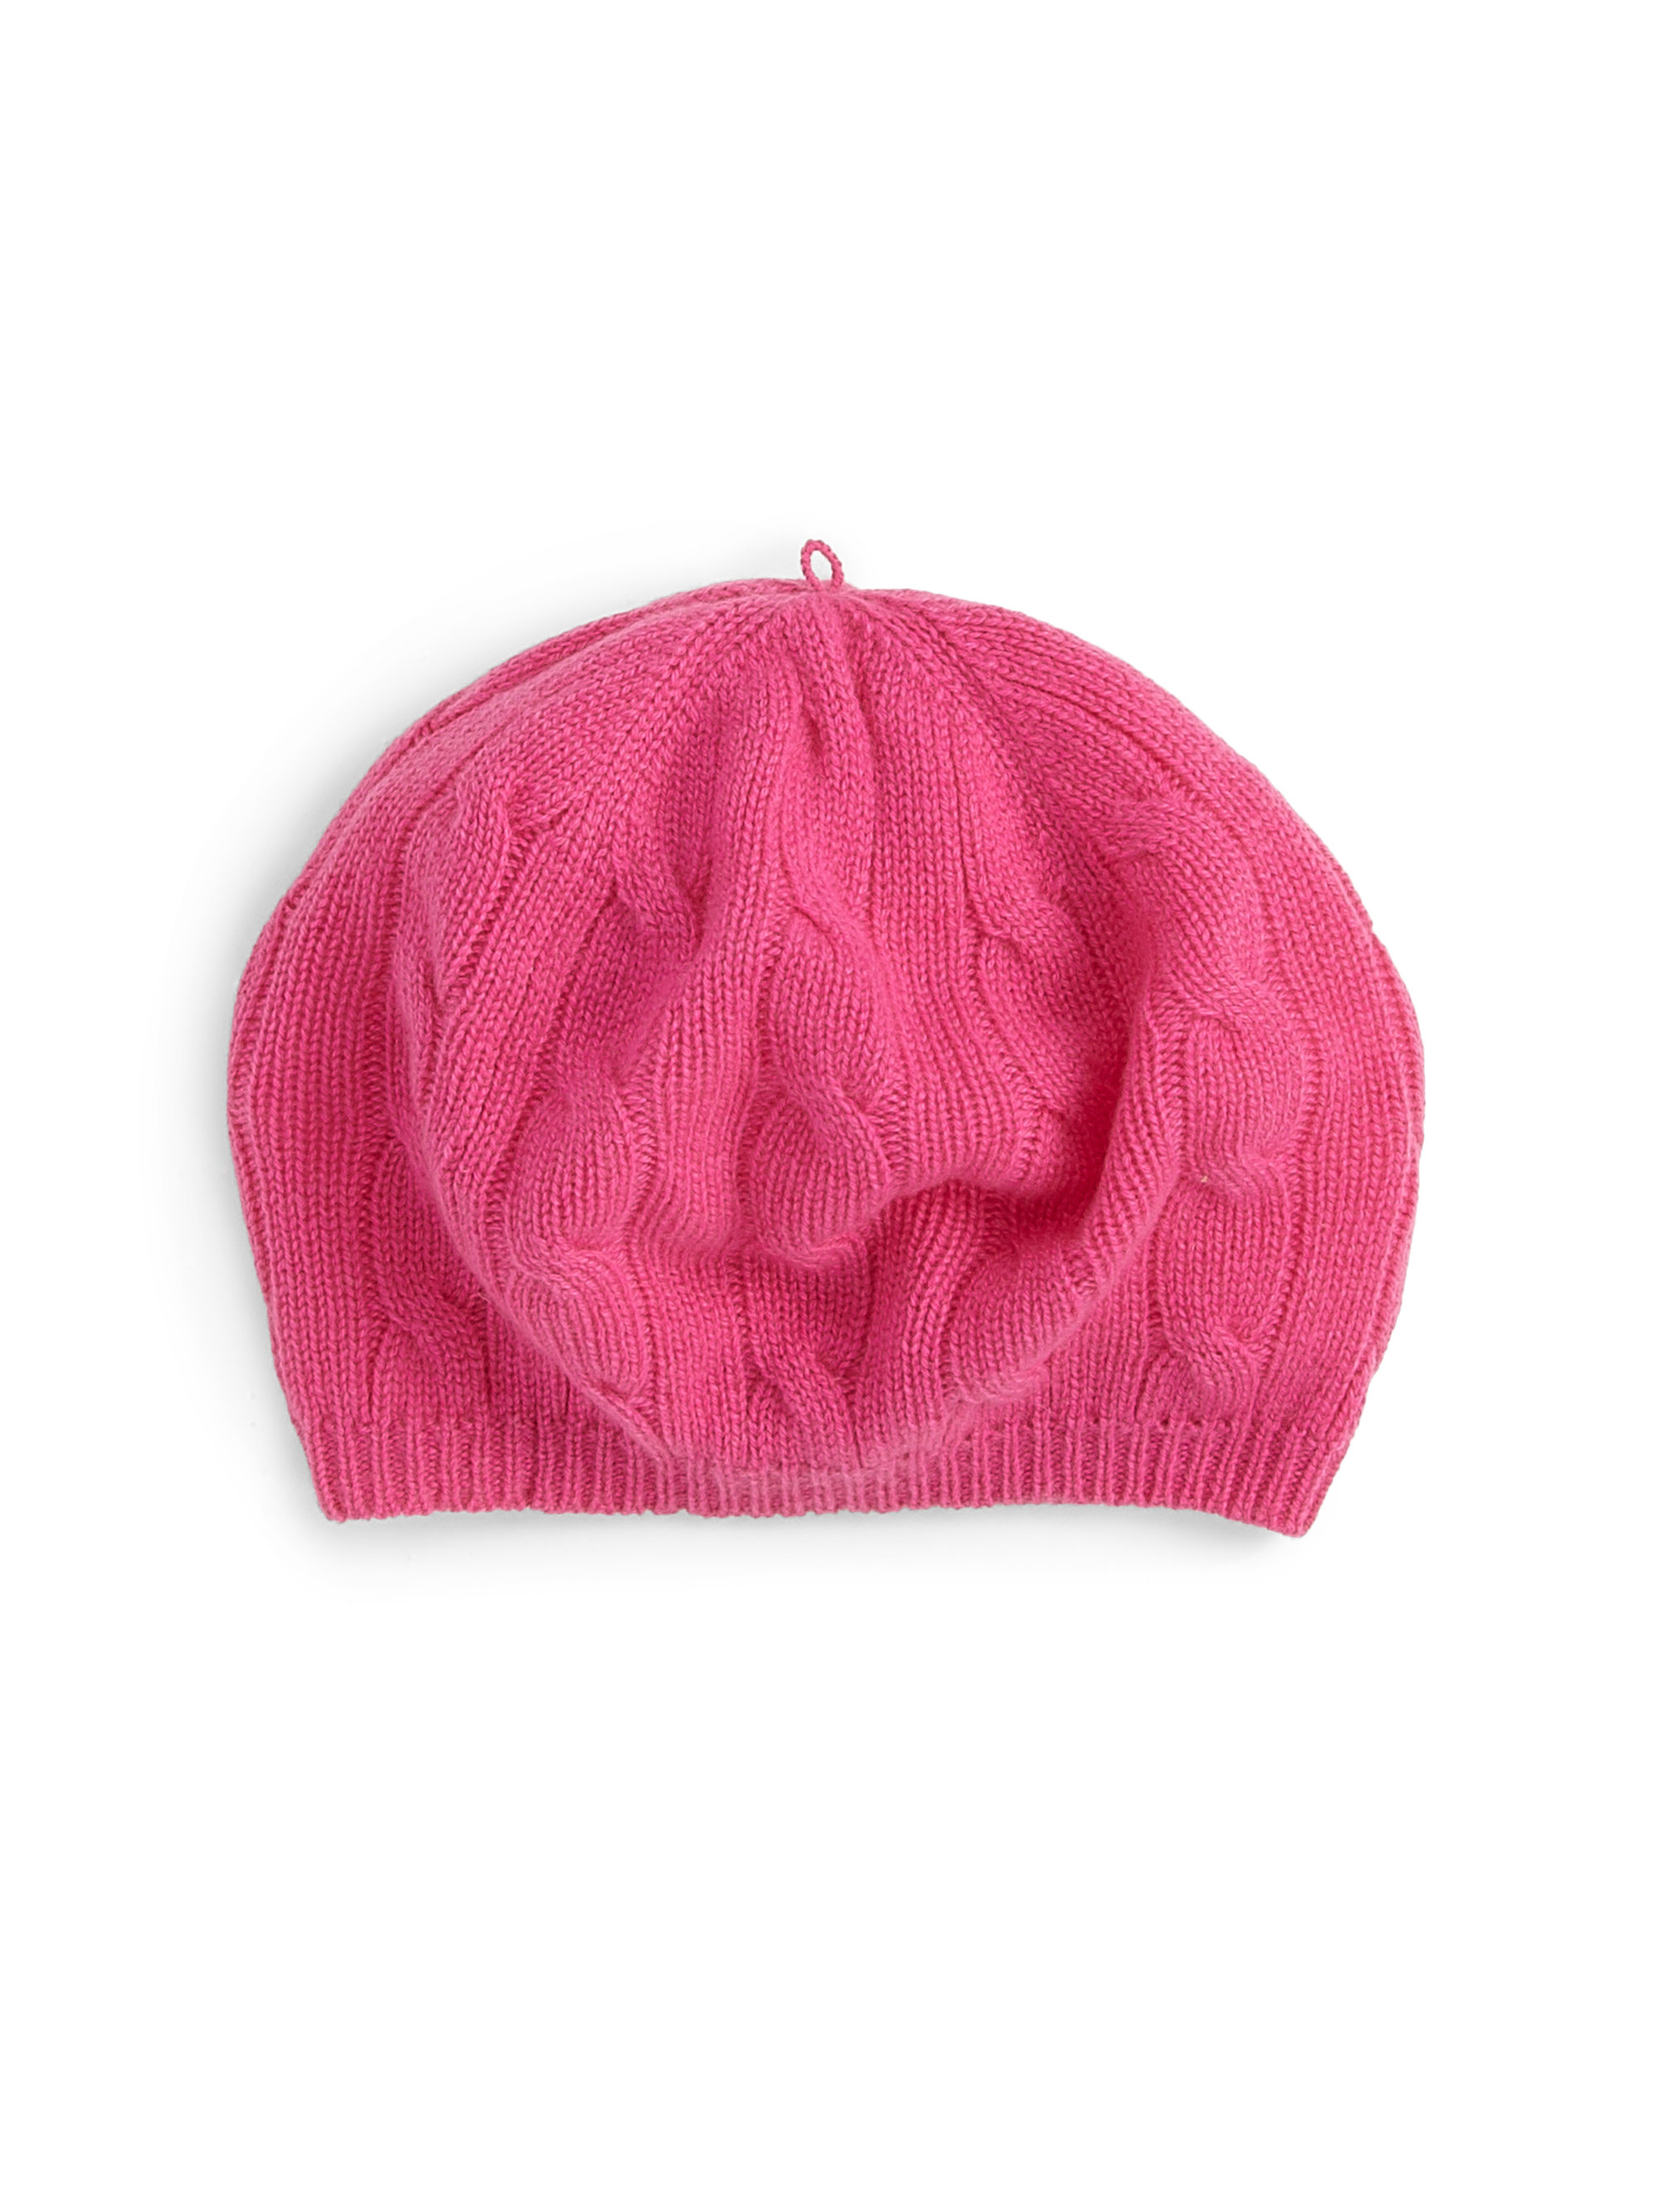 Cashmere Beret Knitting Pattern : Ralph Lauren Little Girls Cashmere Cableknit Beret in Pink Lyst